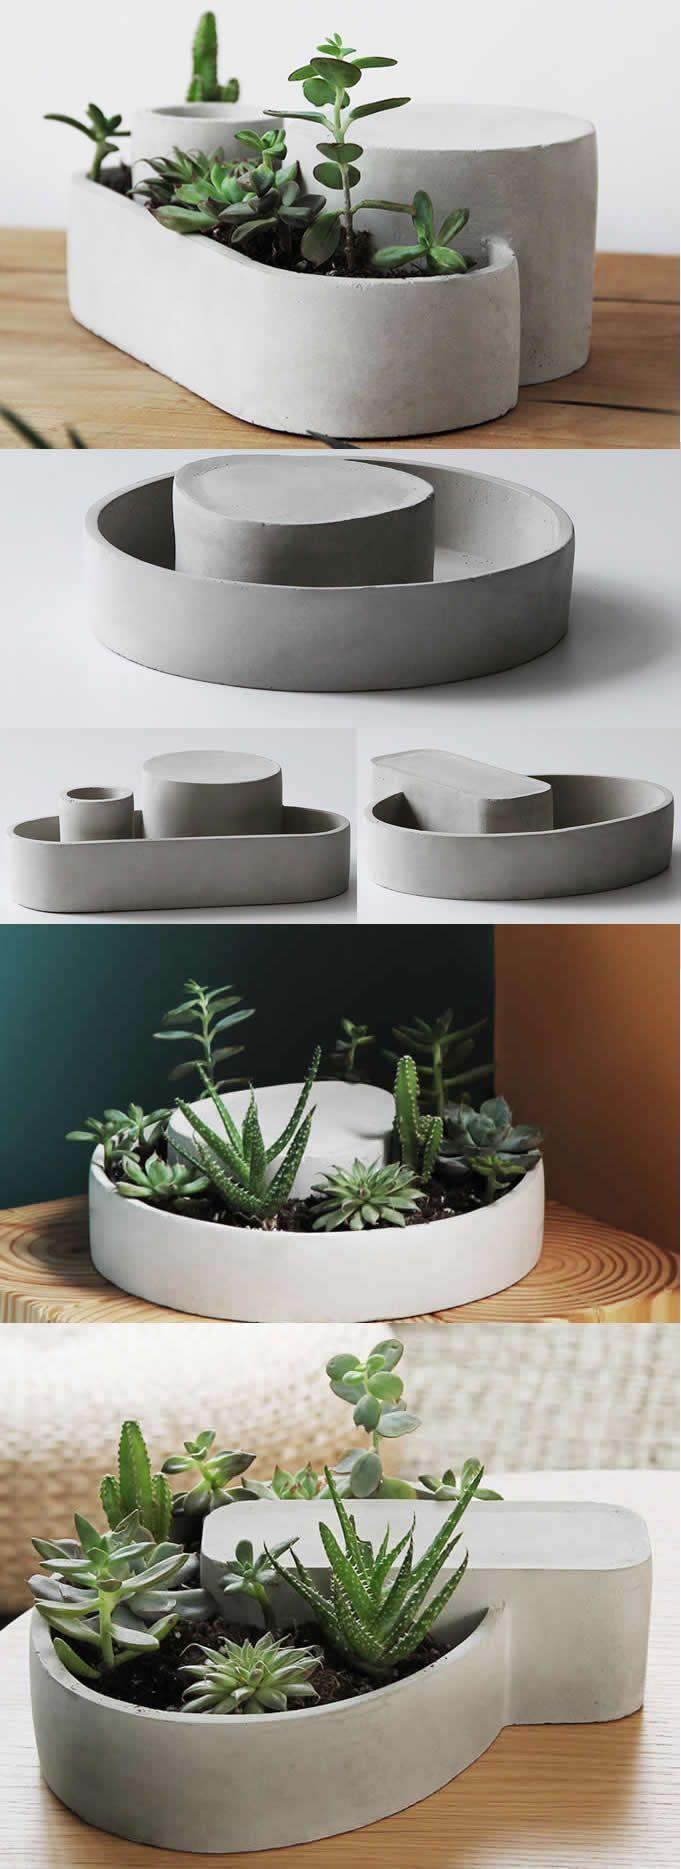 Beton Moderne Geometrische Sukkulente Pflanzer Blumentopf Stift … #beton #blu…